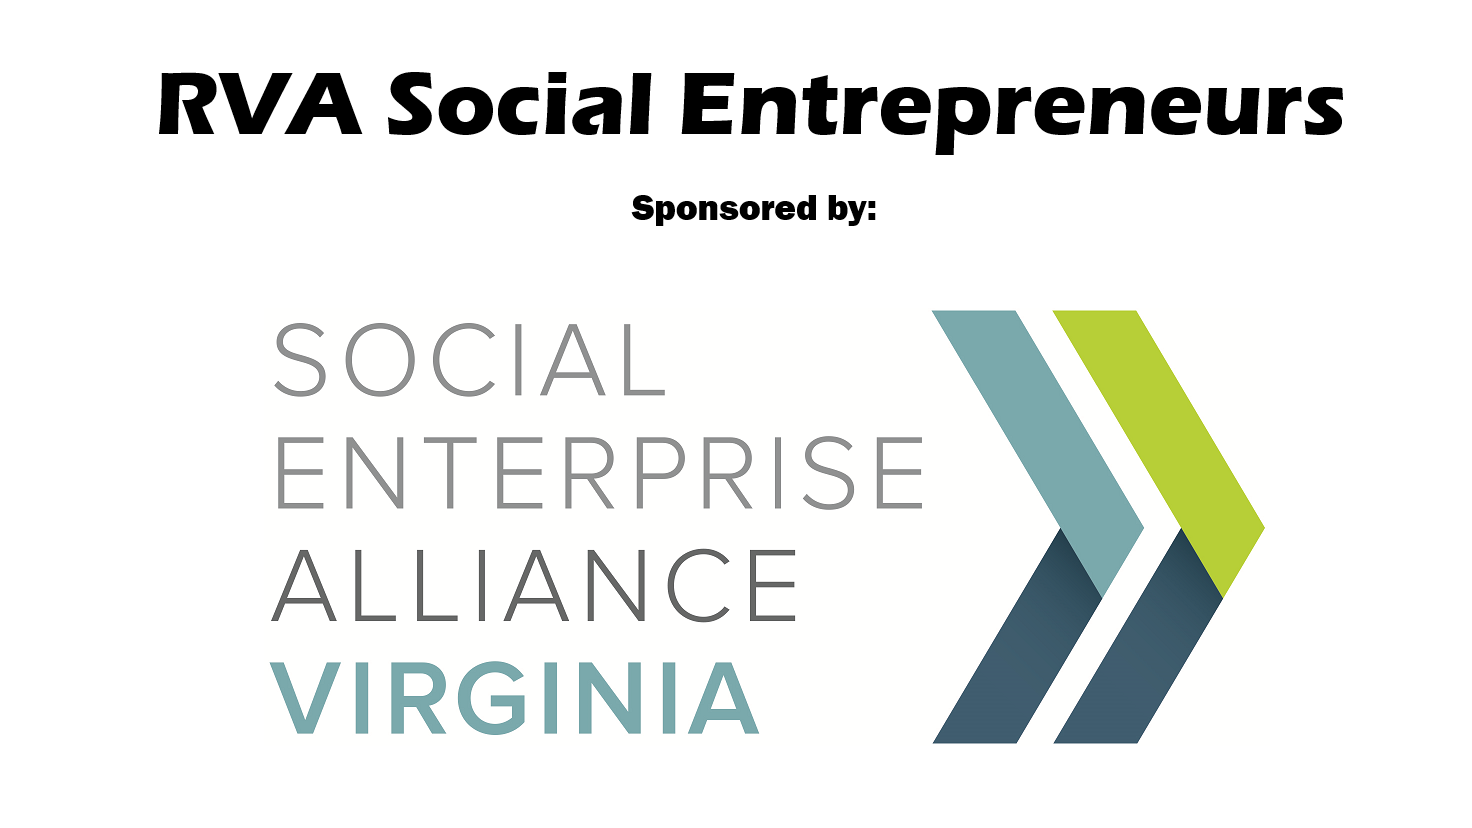 RVA Social Entrepreneurs